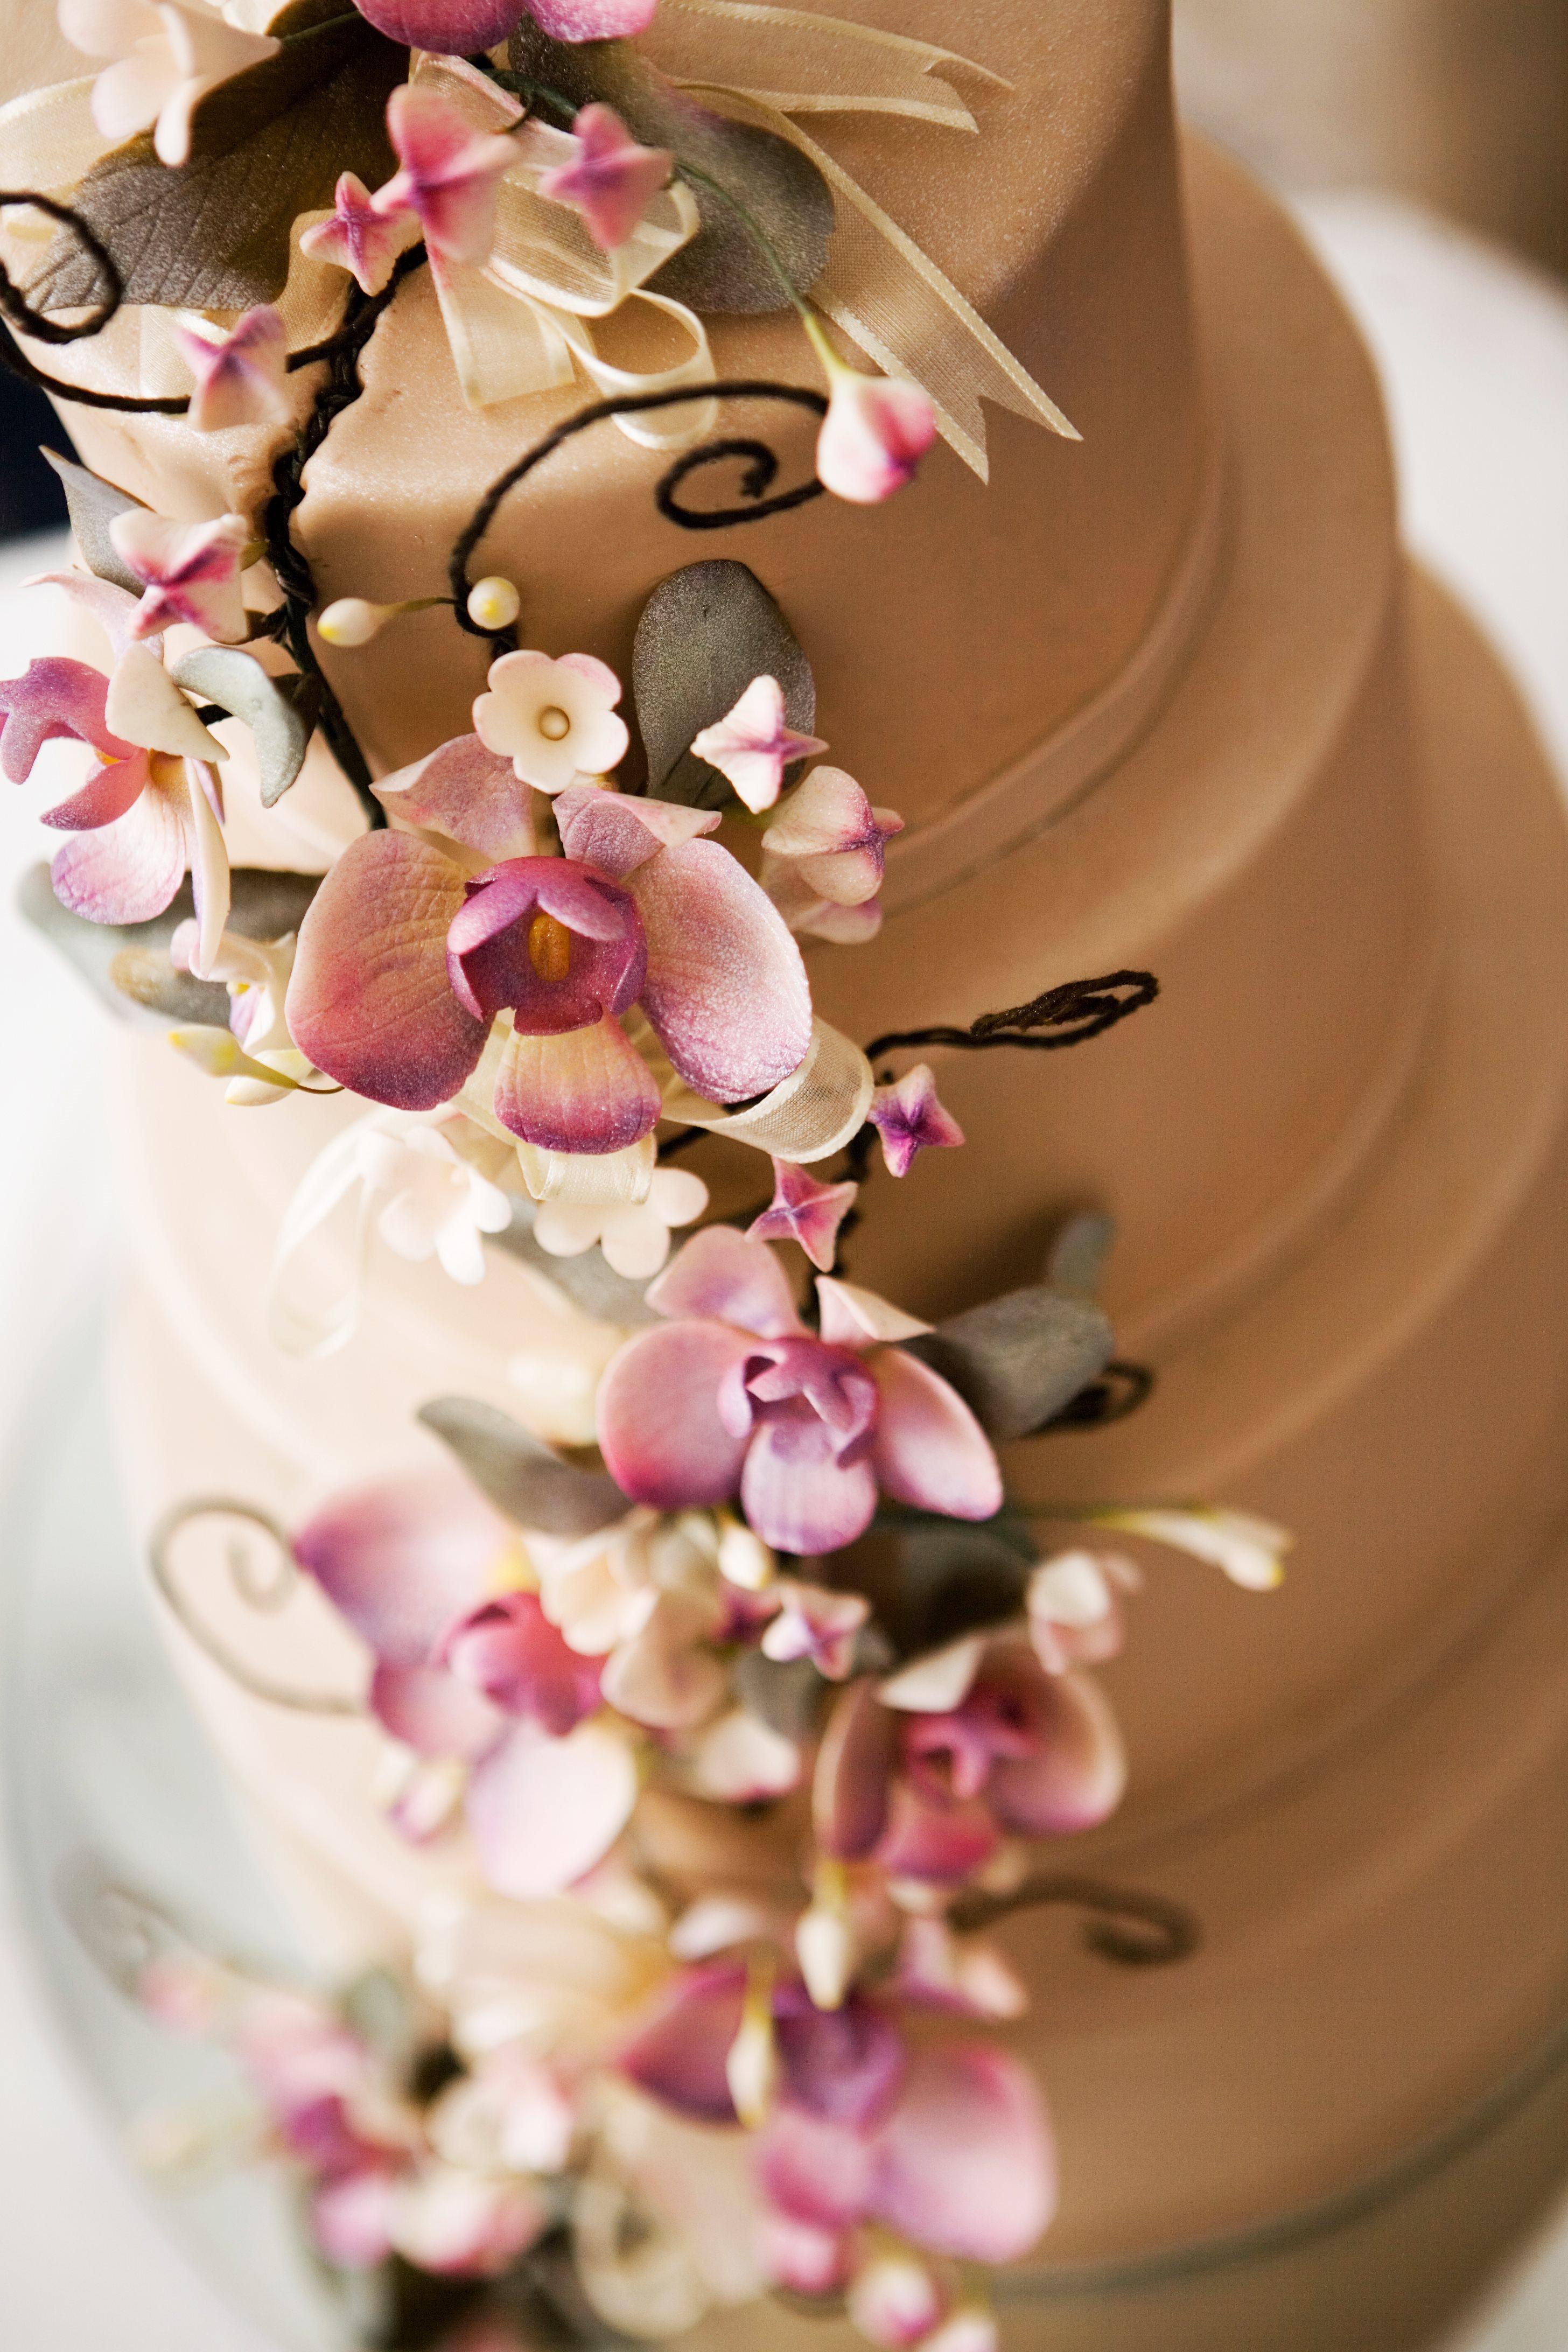 Home - Sugar Arts Institute: Cake Decorating Classes, Receptions ...